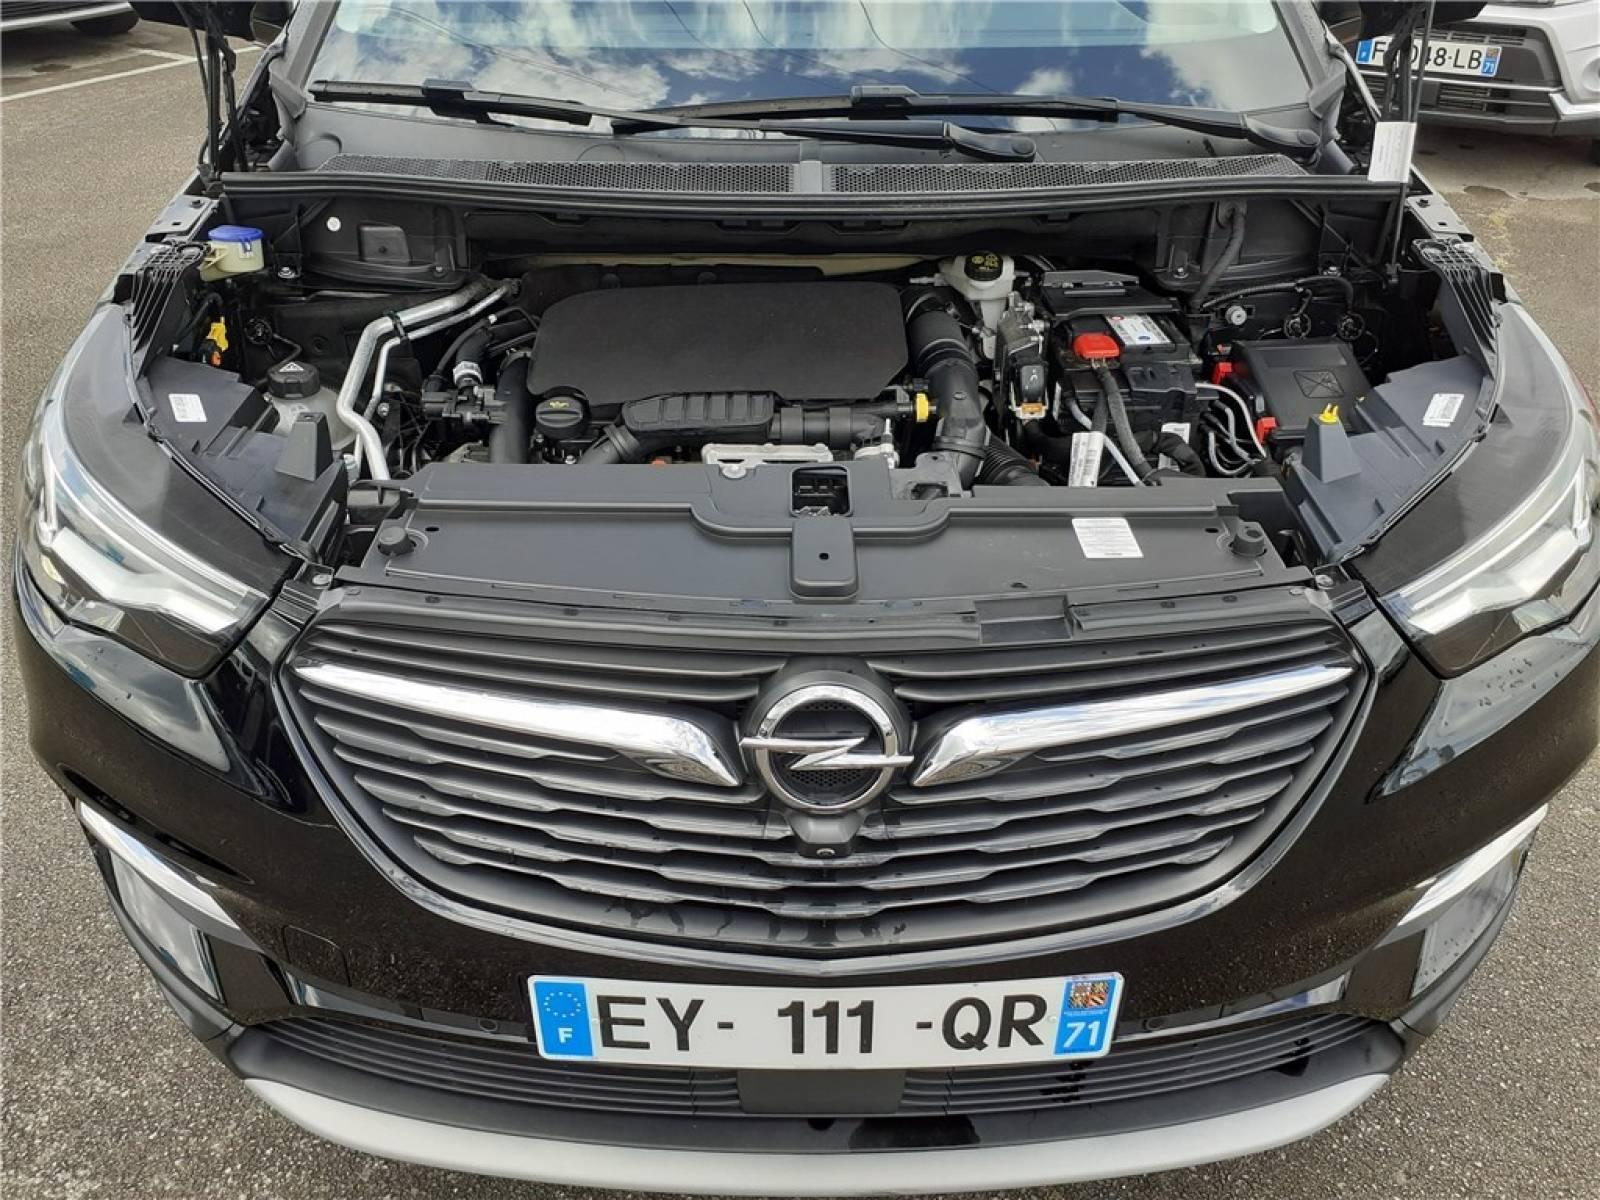 OPEL Grandland X 1.2 Turbo 130 ch BVA6 - véhicule d'occasion - Groupe Guillet - Opel Magicauto - Chalon-sur-Saône - 71380 - Saint-Marcel - 13